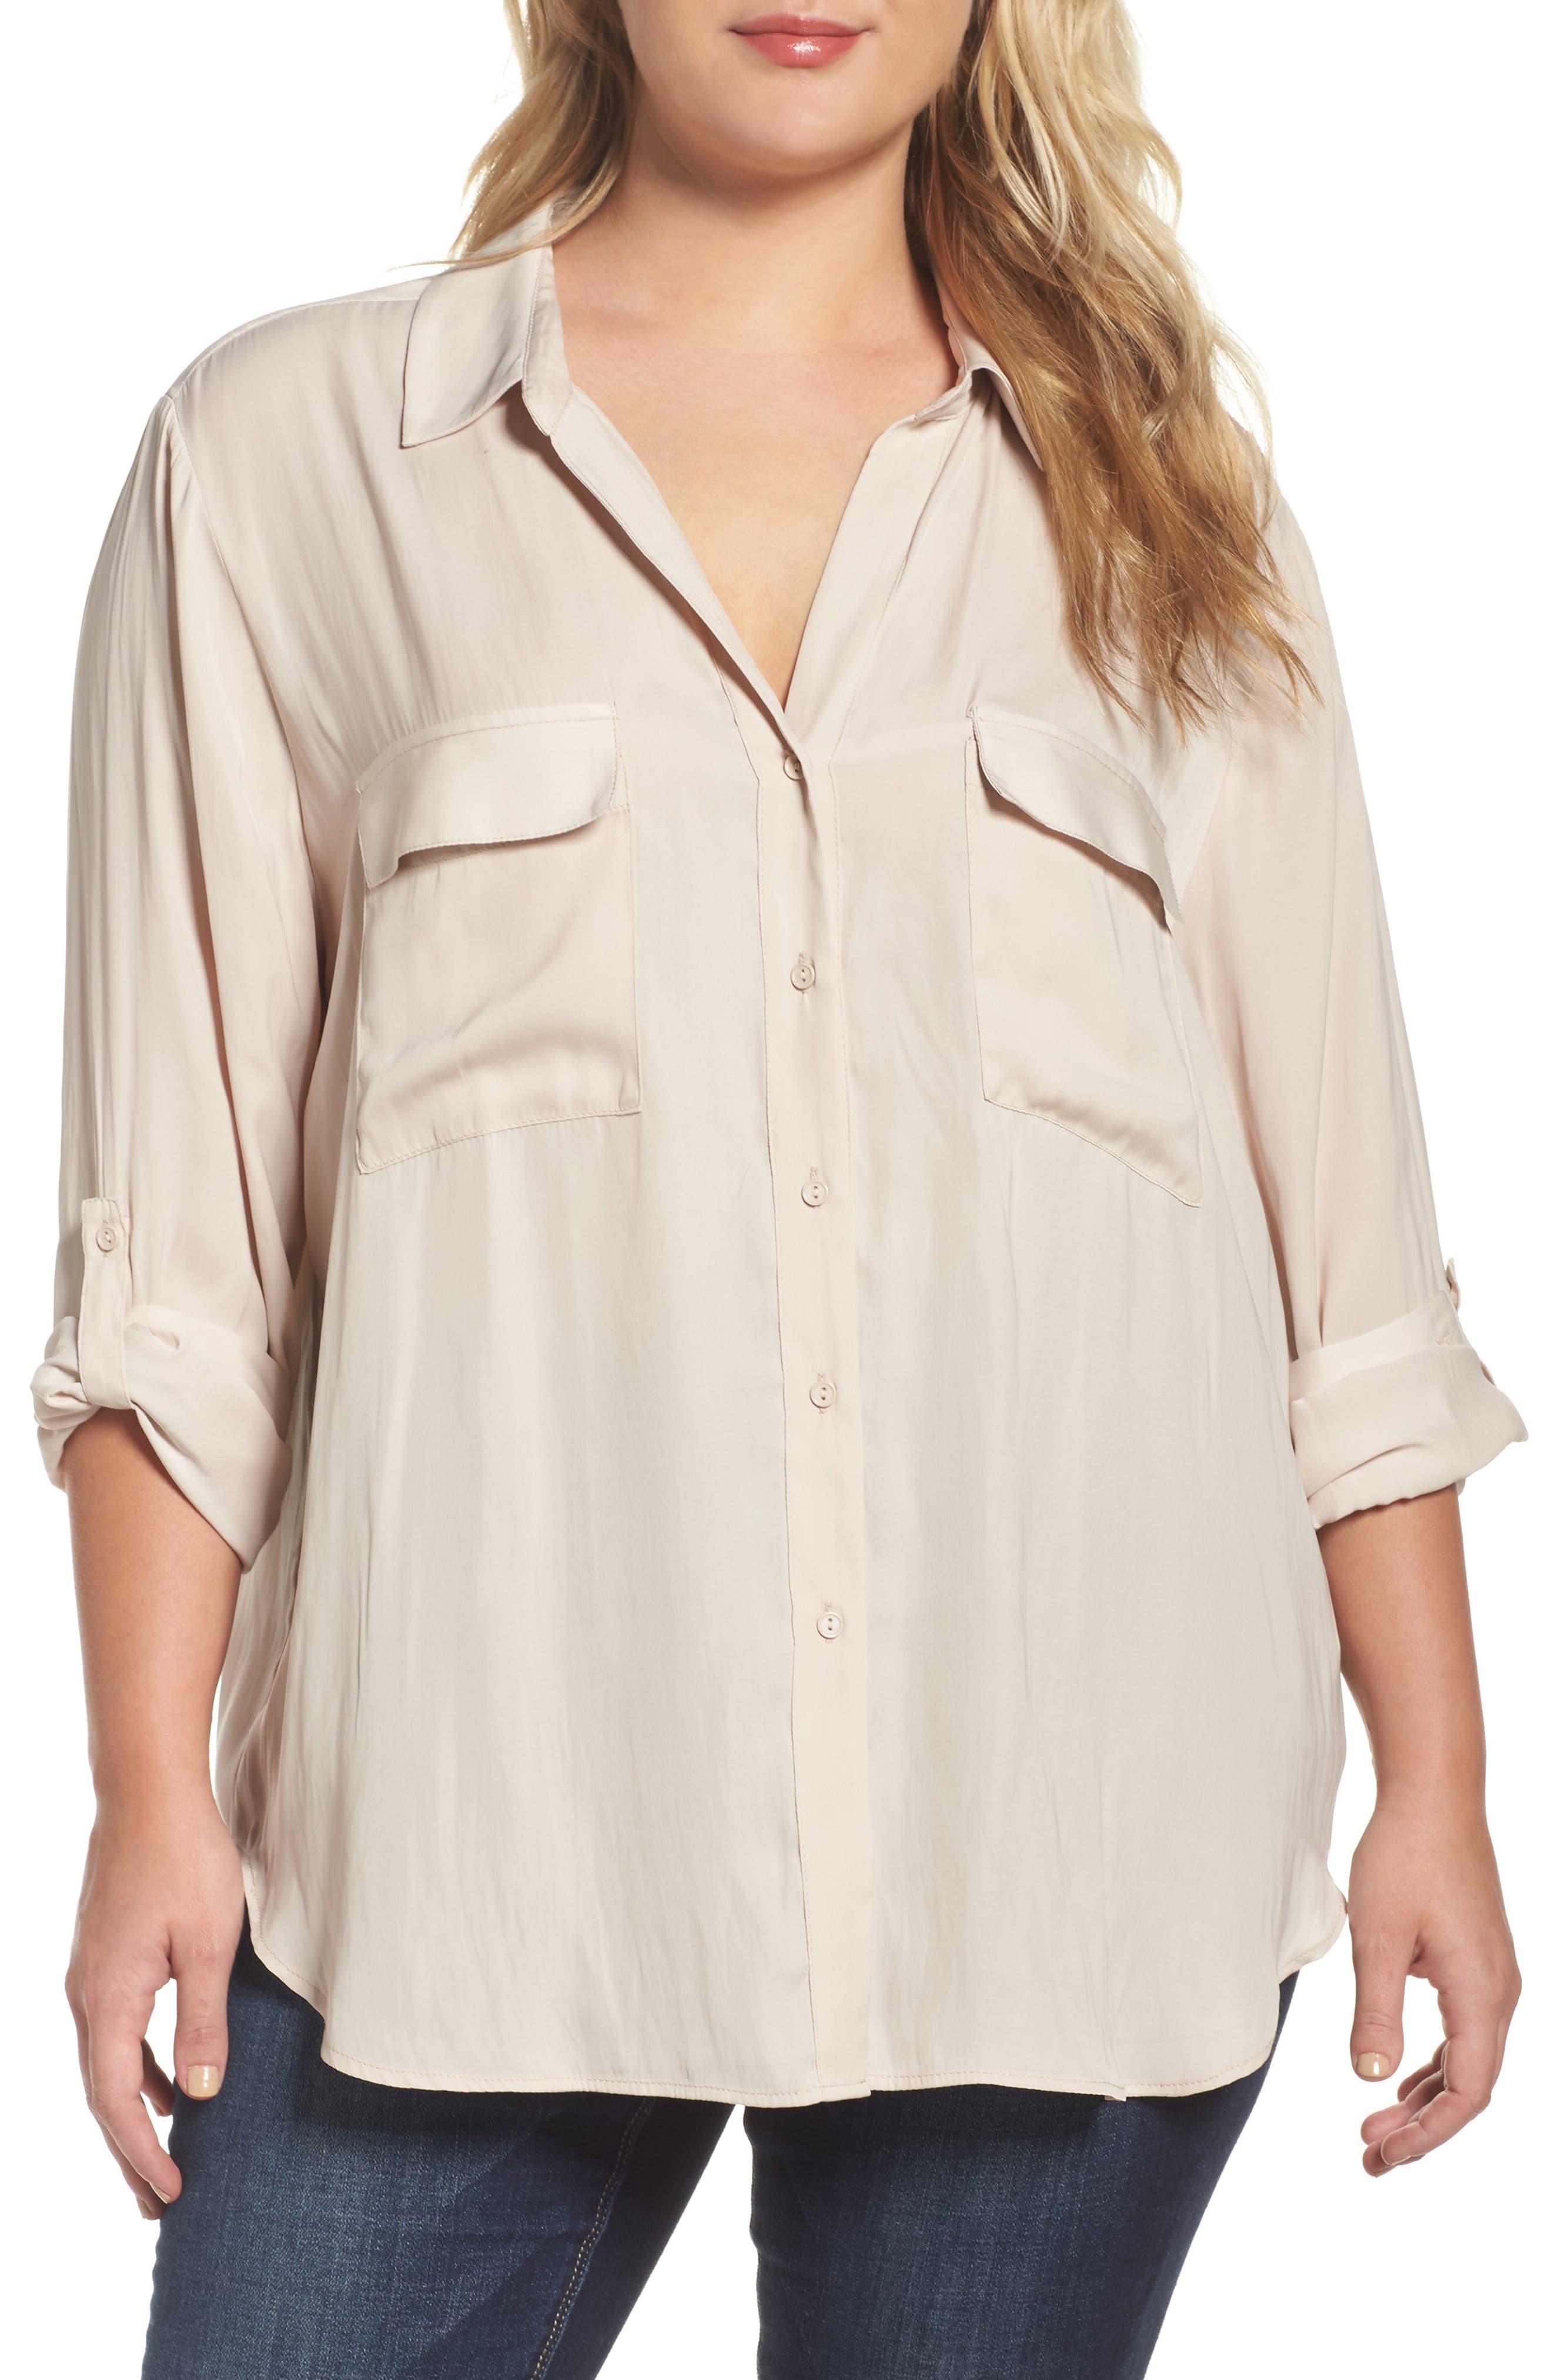 Carol Roll-Sleeve Blouse,                         Main,                         color, 900